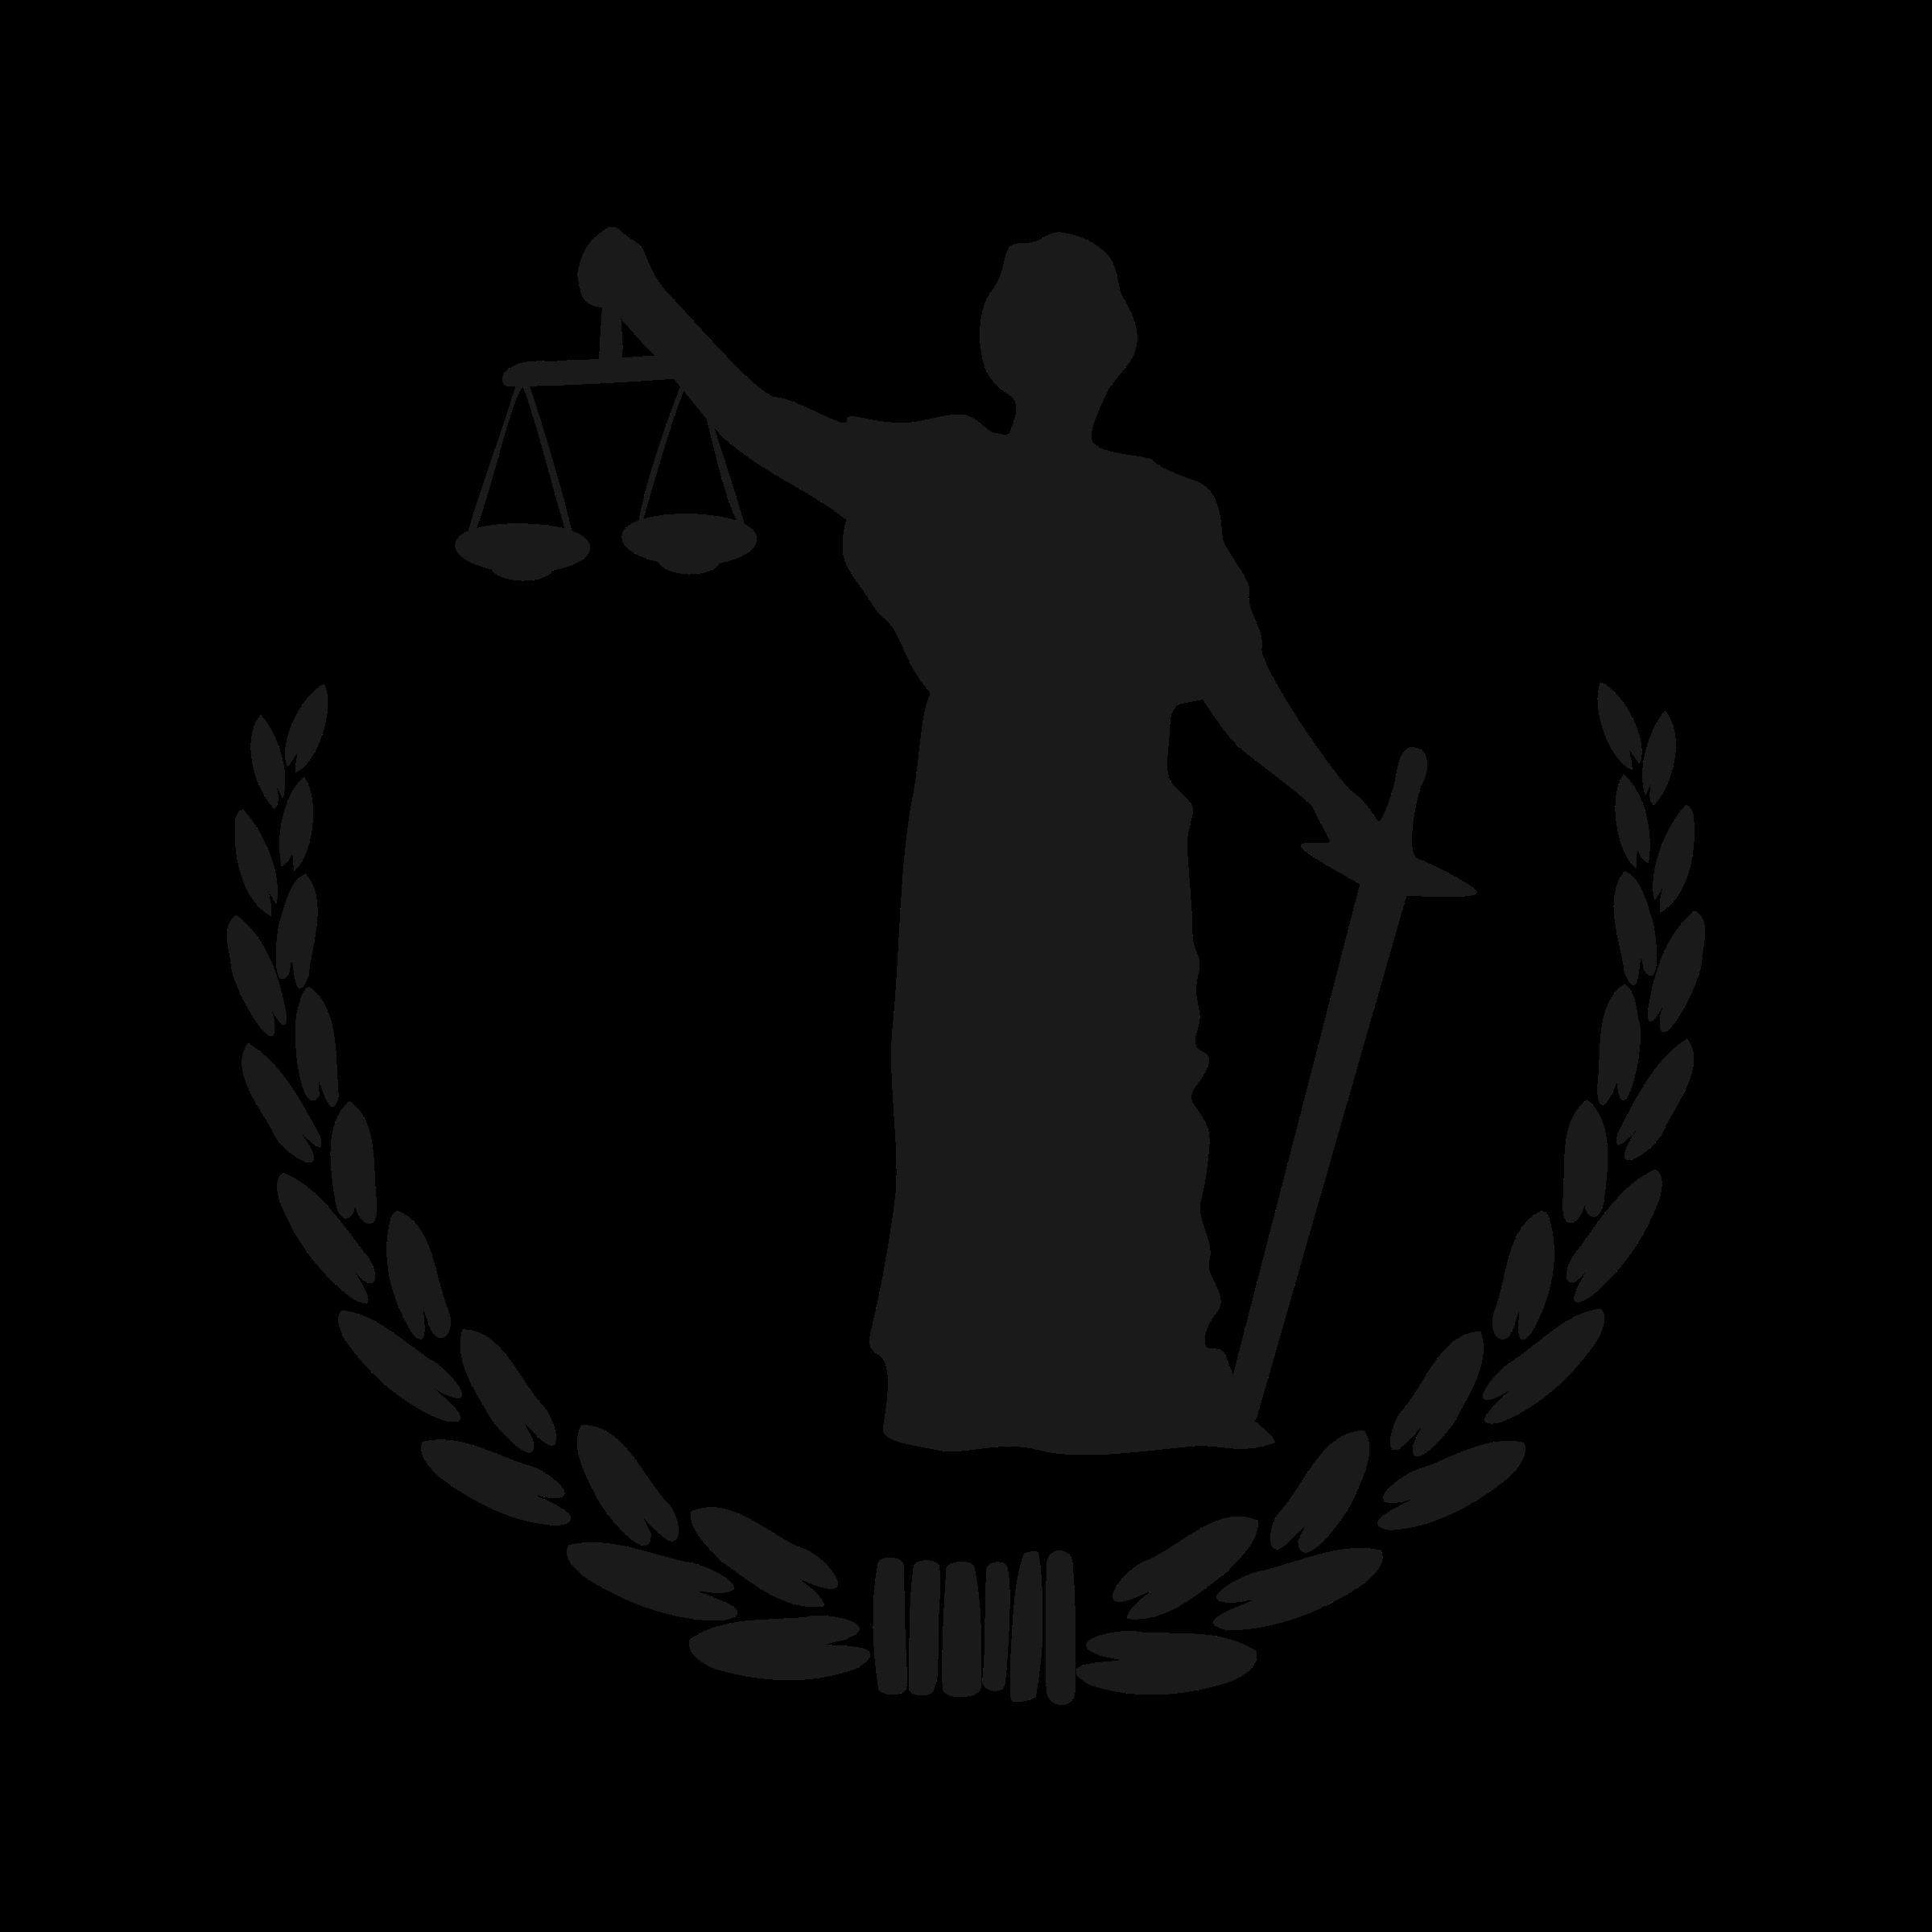 Free photo law non. Justice clipart